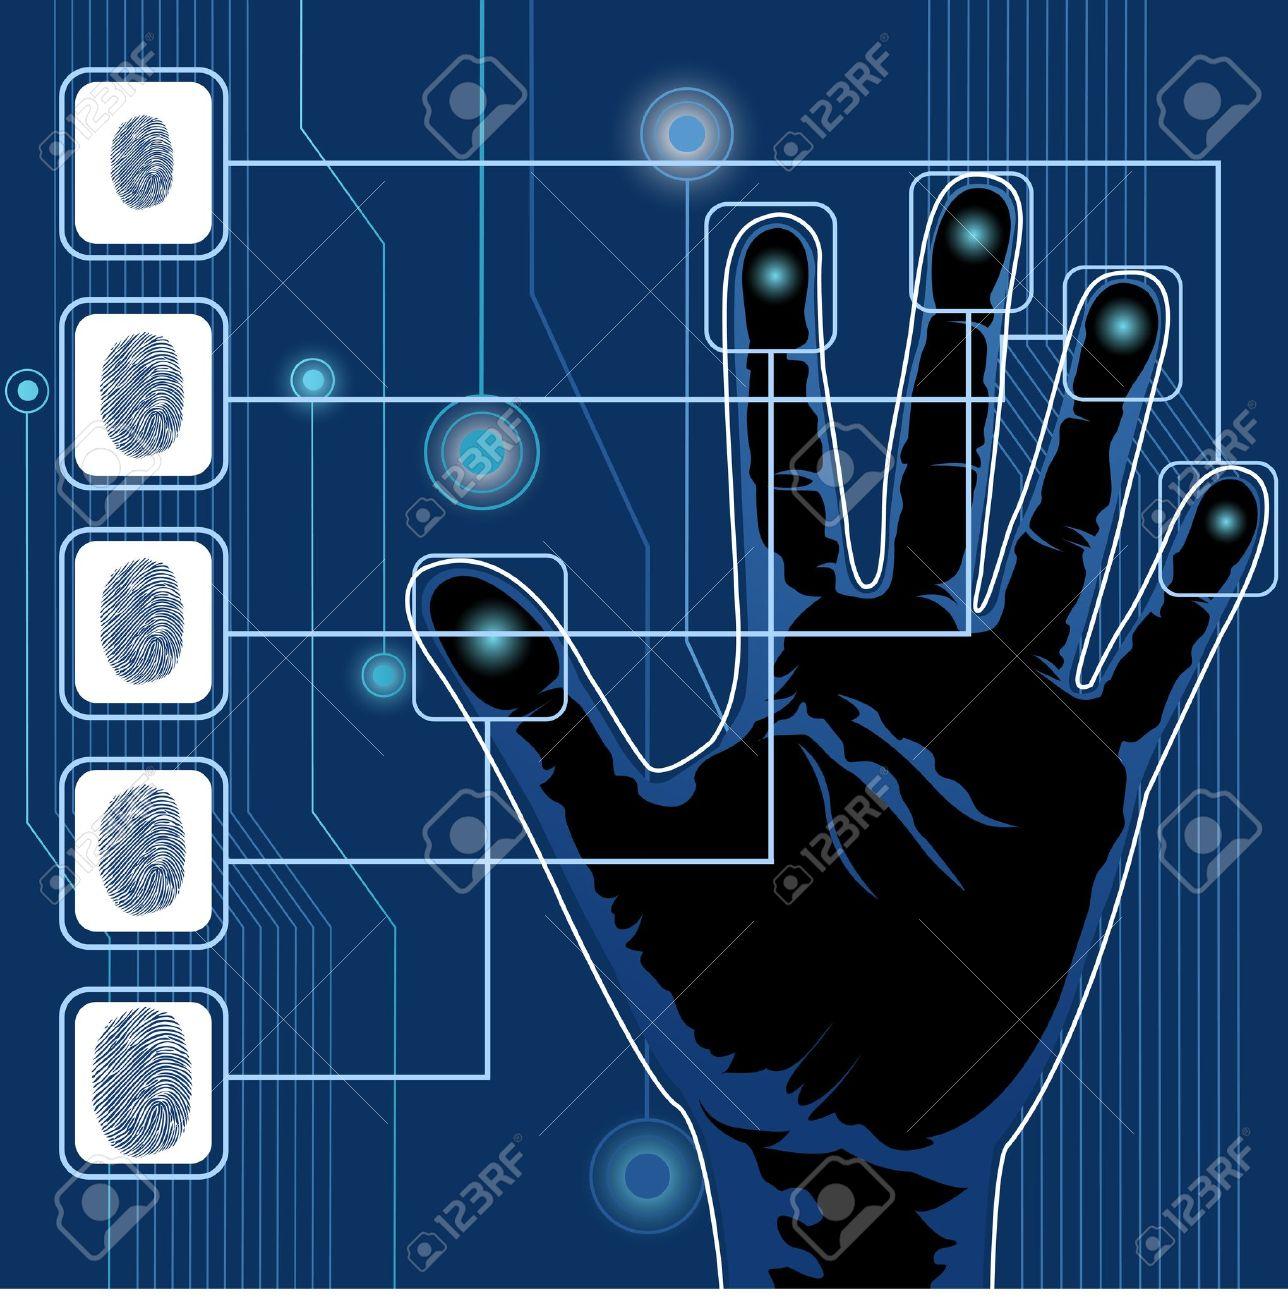 illustration of finger print testing with hand scanning - 8919964